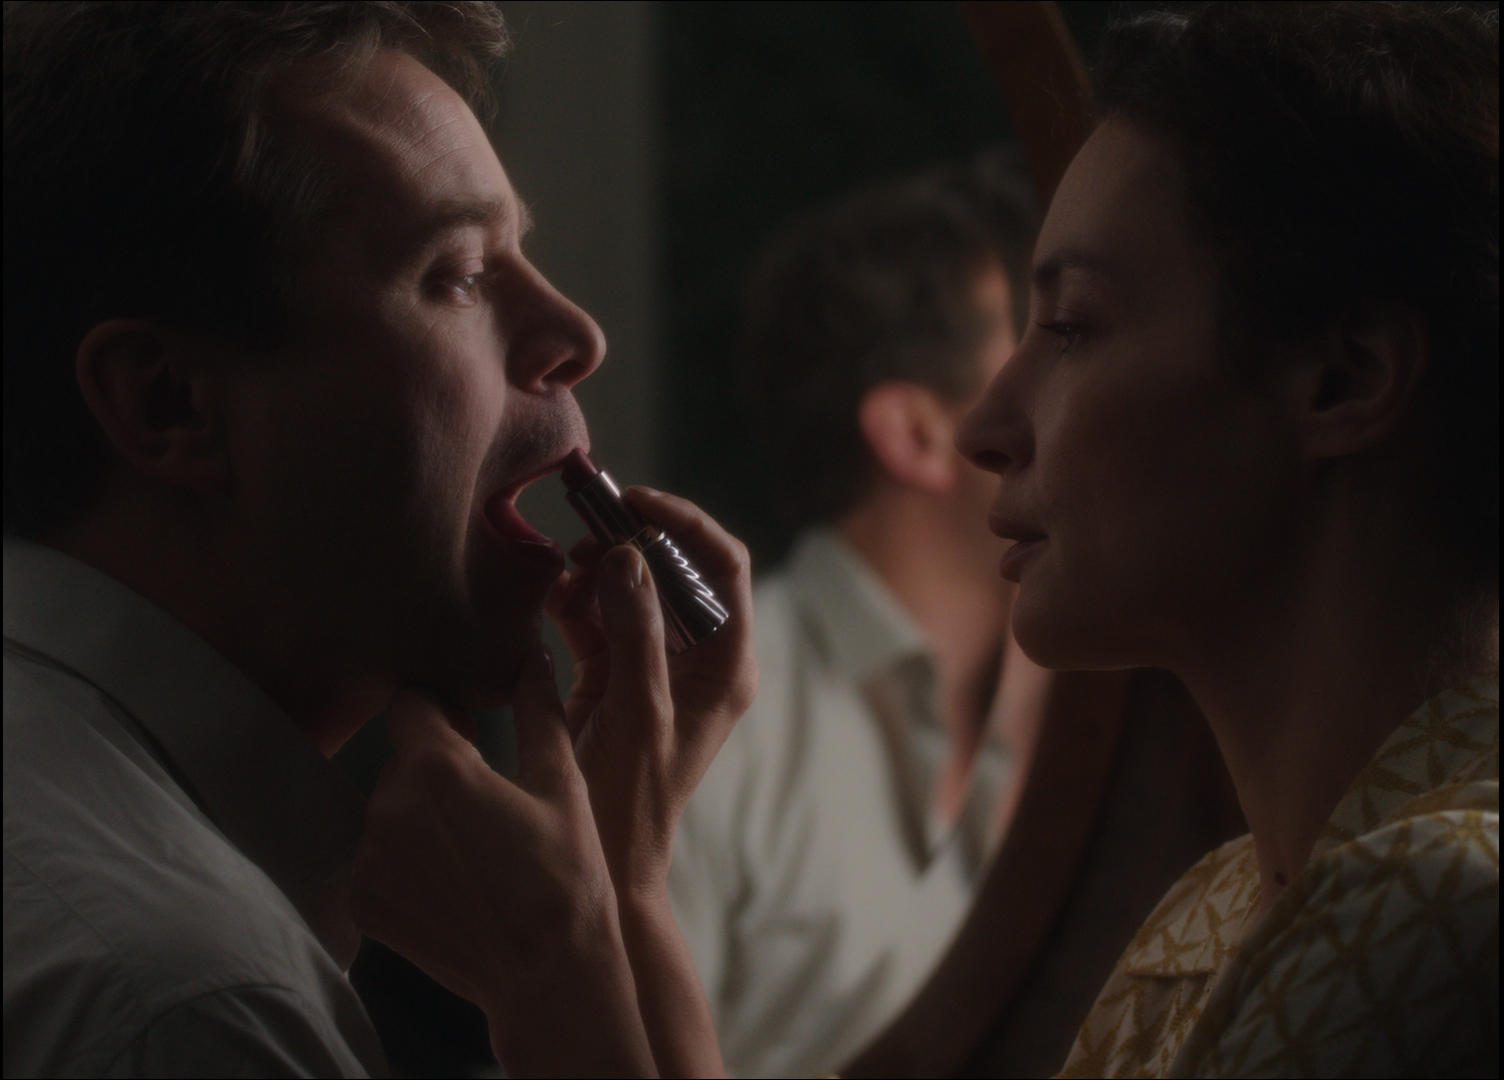 Les nuits d'été: Guillaume de Tonquedec e Nicolas Bouchaud in una scena del film